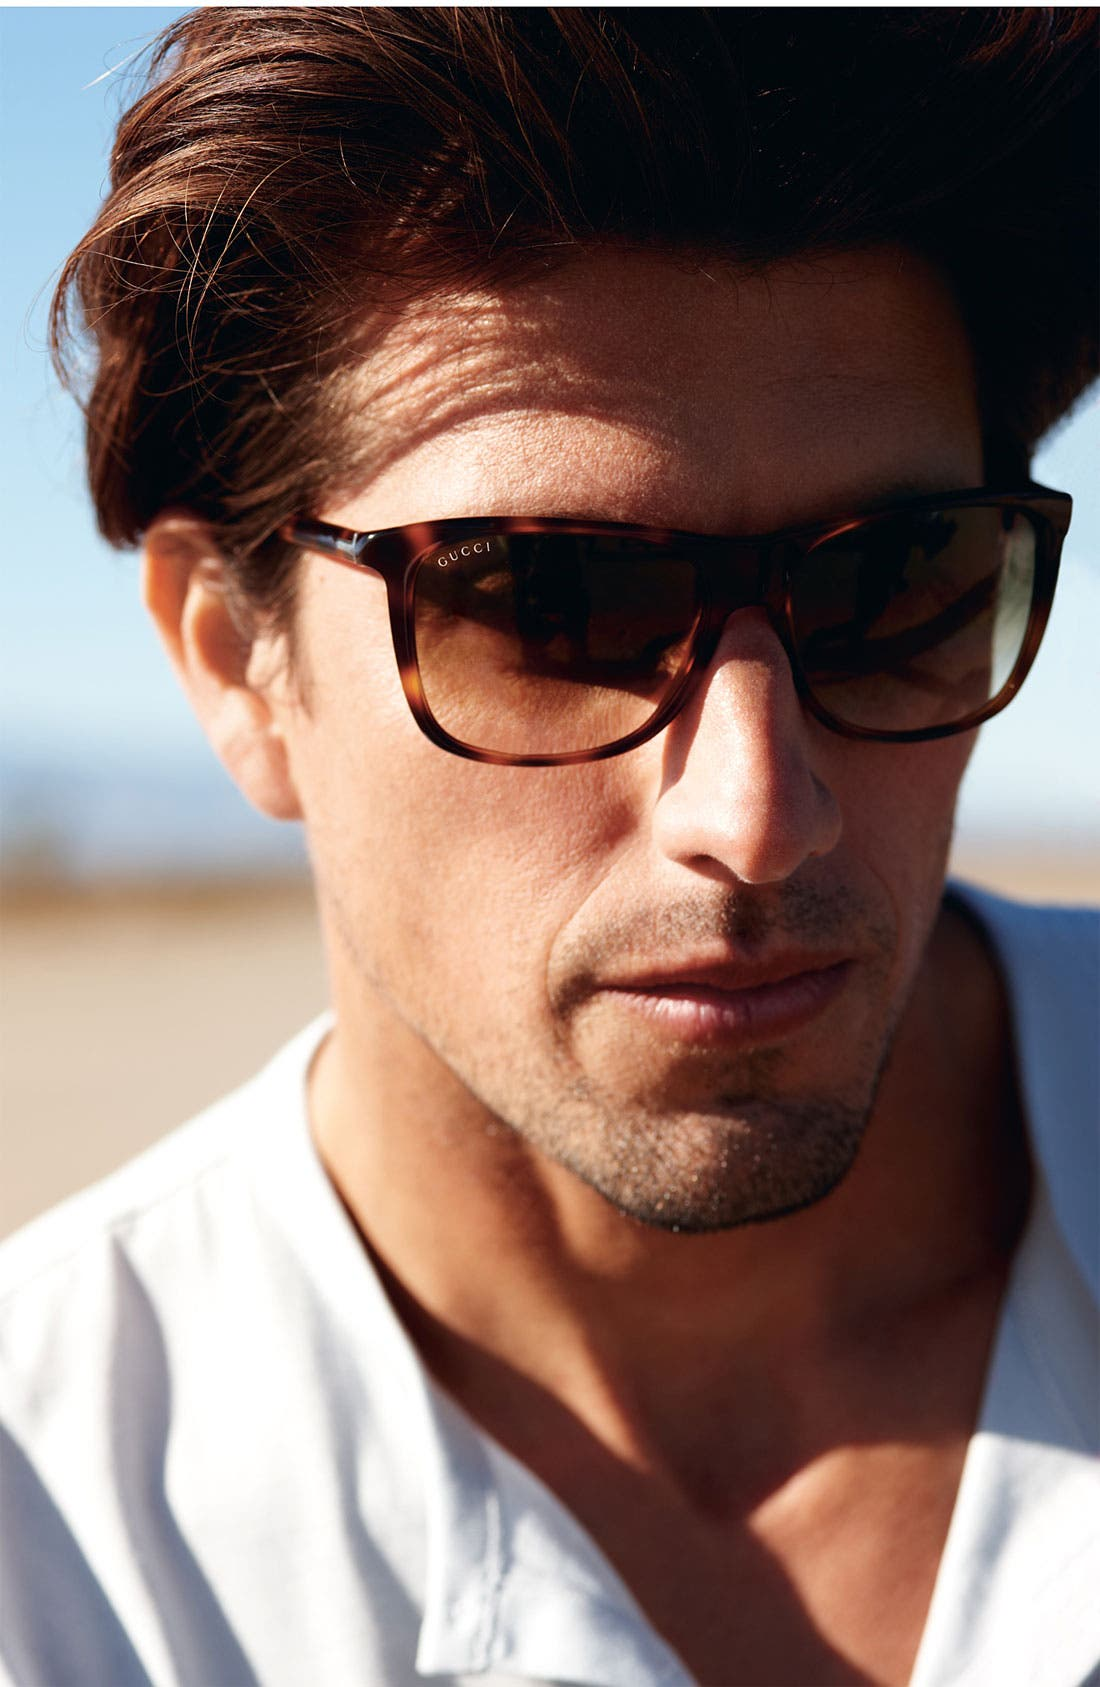 Alternate Image 3  - Gucci Rectangular 55mm Sunglasses